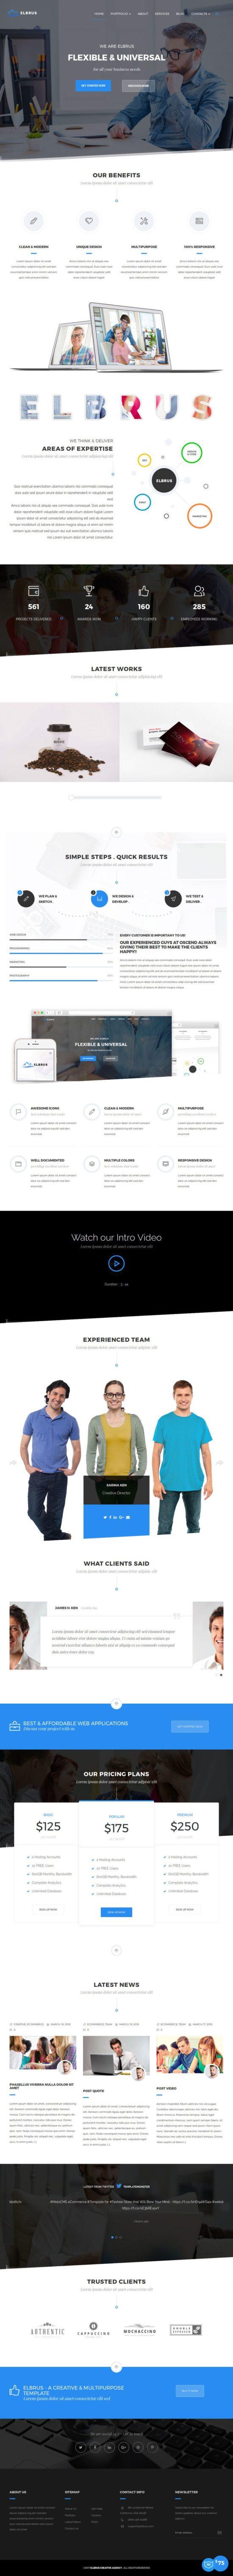 elbrus template monster wordpress theme 01 550x6087 - Elbrus WordPress Theme